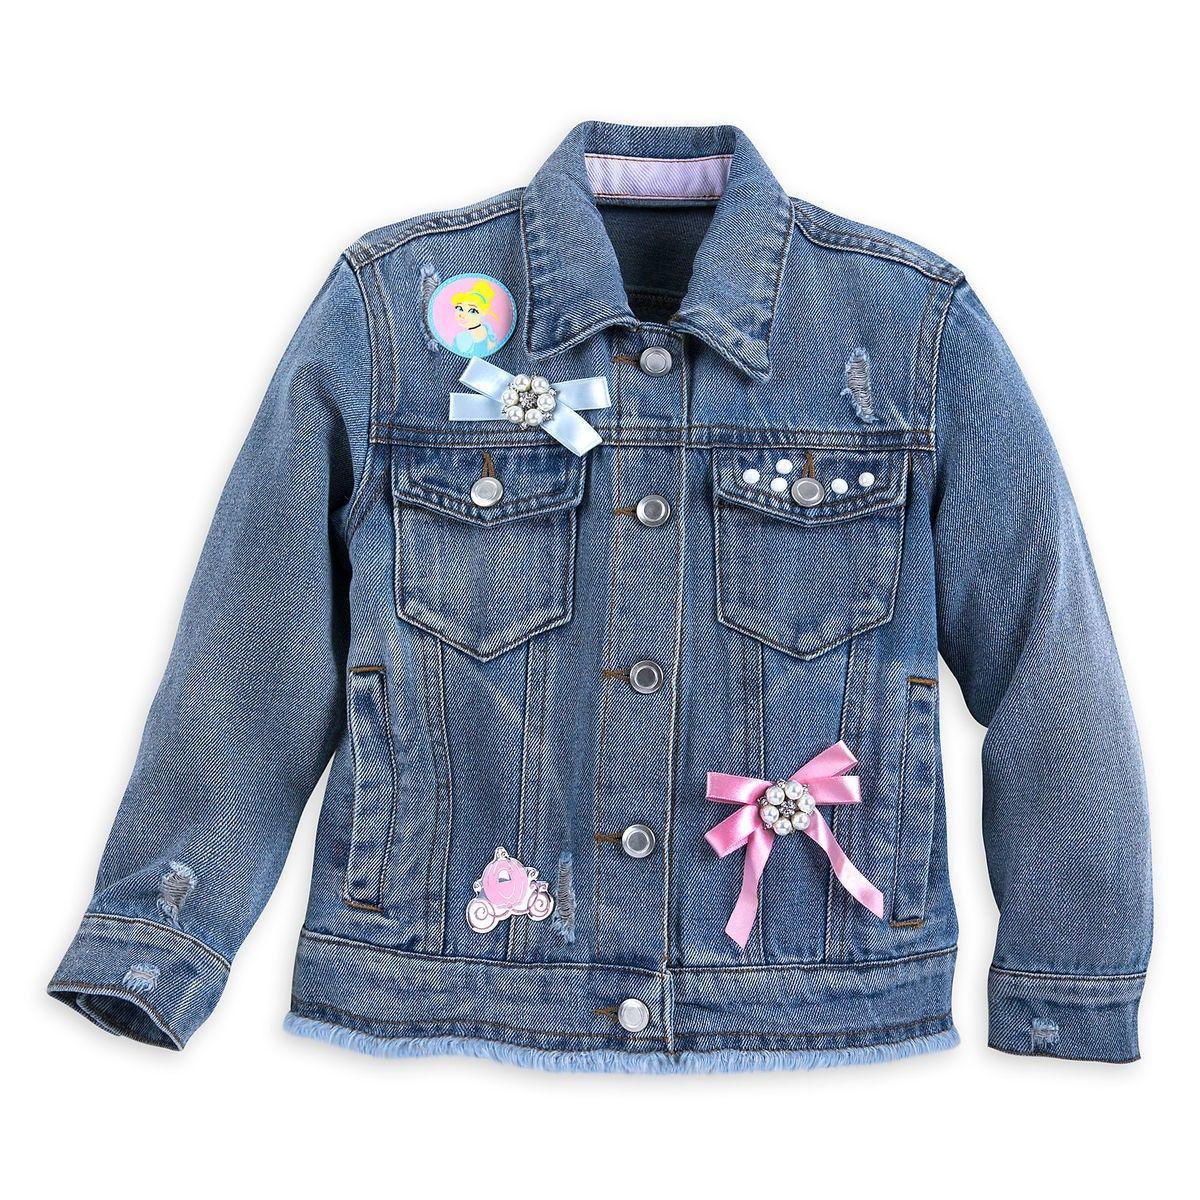 Cinderella Inspired Vintage Look Disney Princess Denim Jacket Girls Denim Jacket Denim Jacket Patches Girls Jacket [ 1200 x 1200 Pixel ]